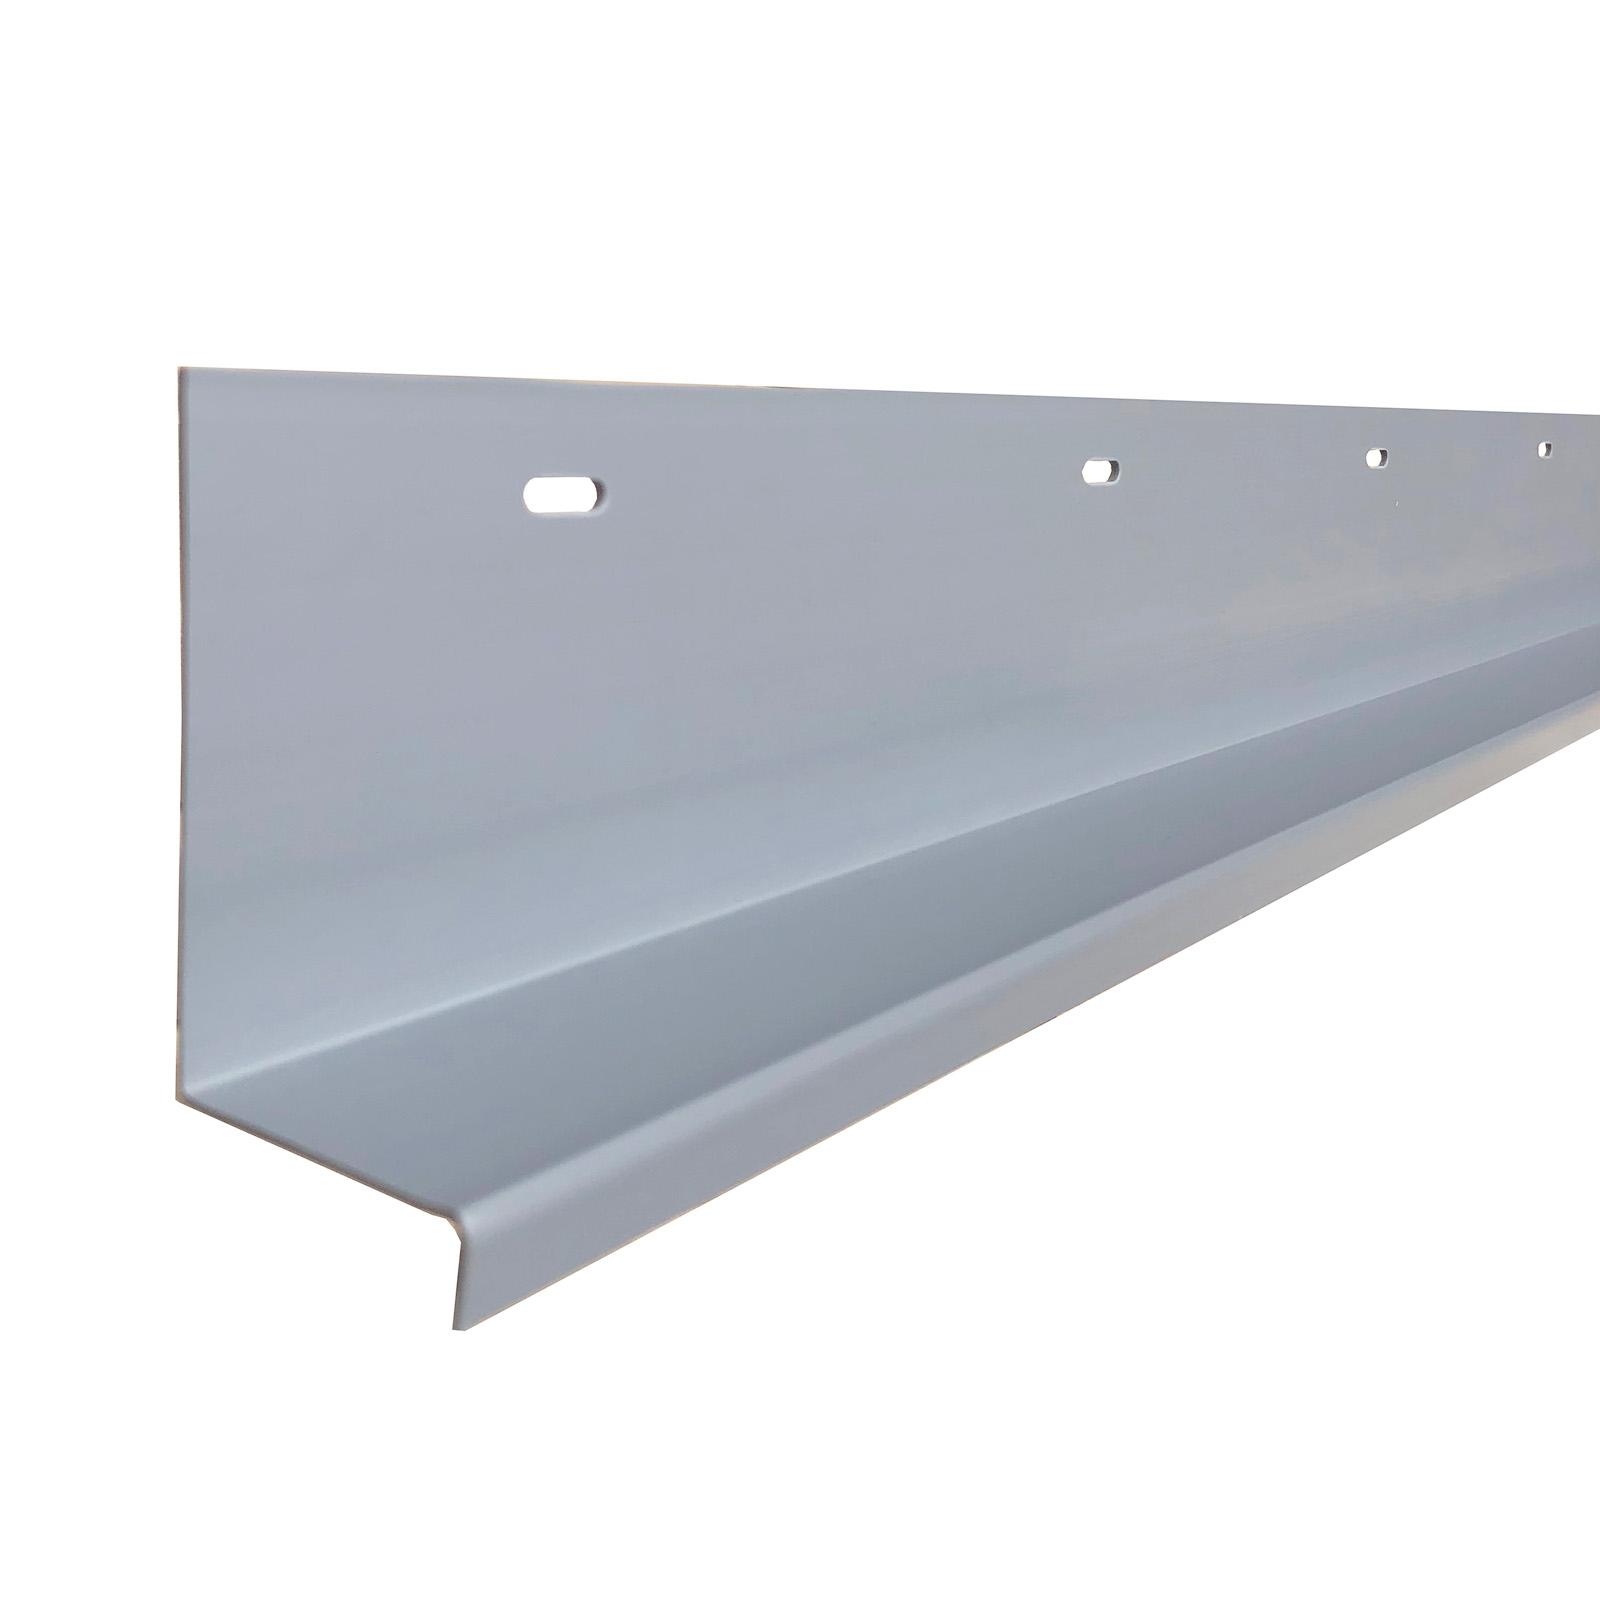 Deck Ledger Flashing Cap Plastic Gray